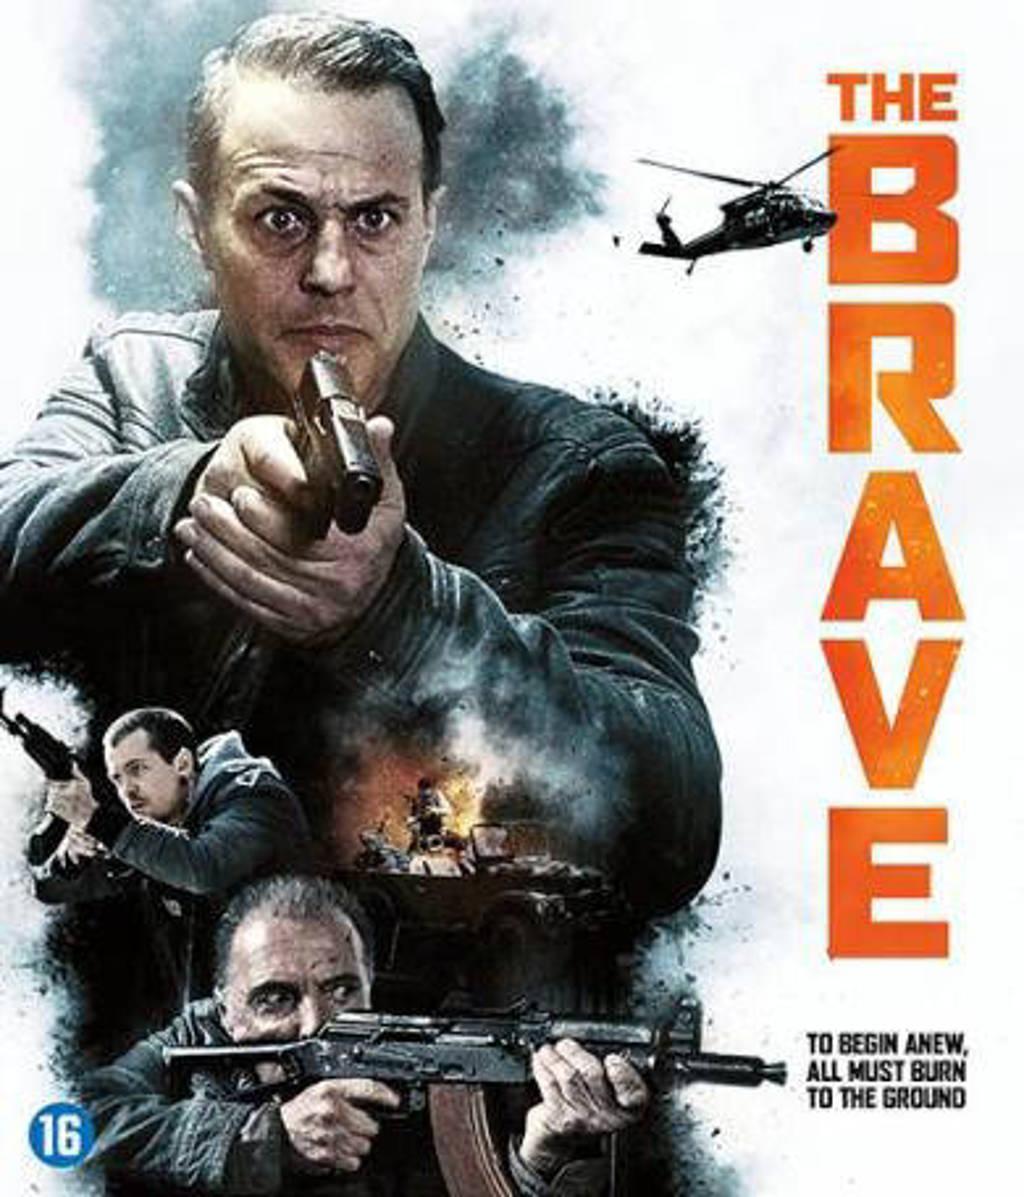 The brave (Blu-ray)